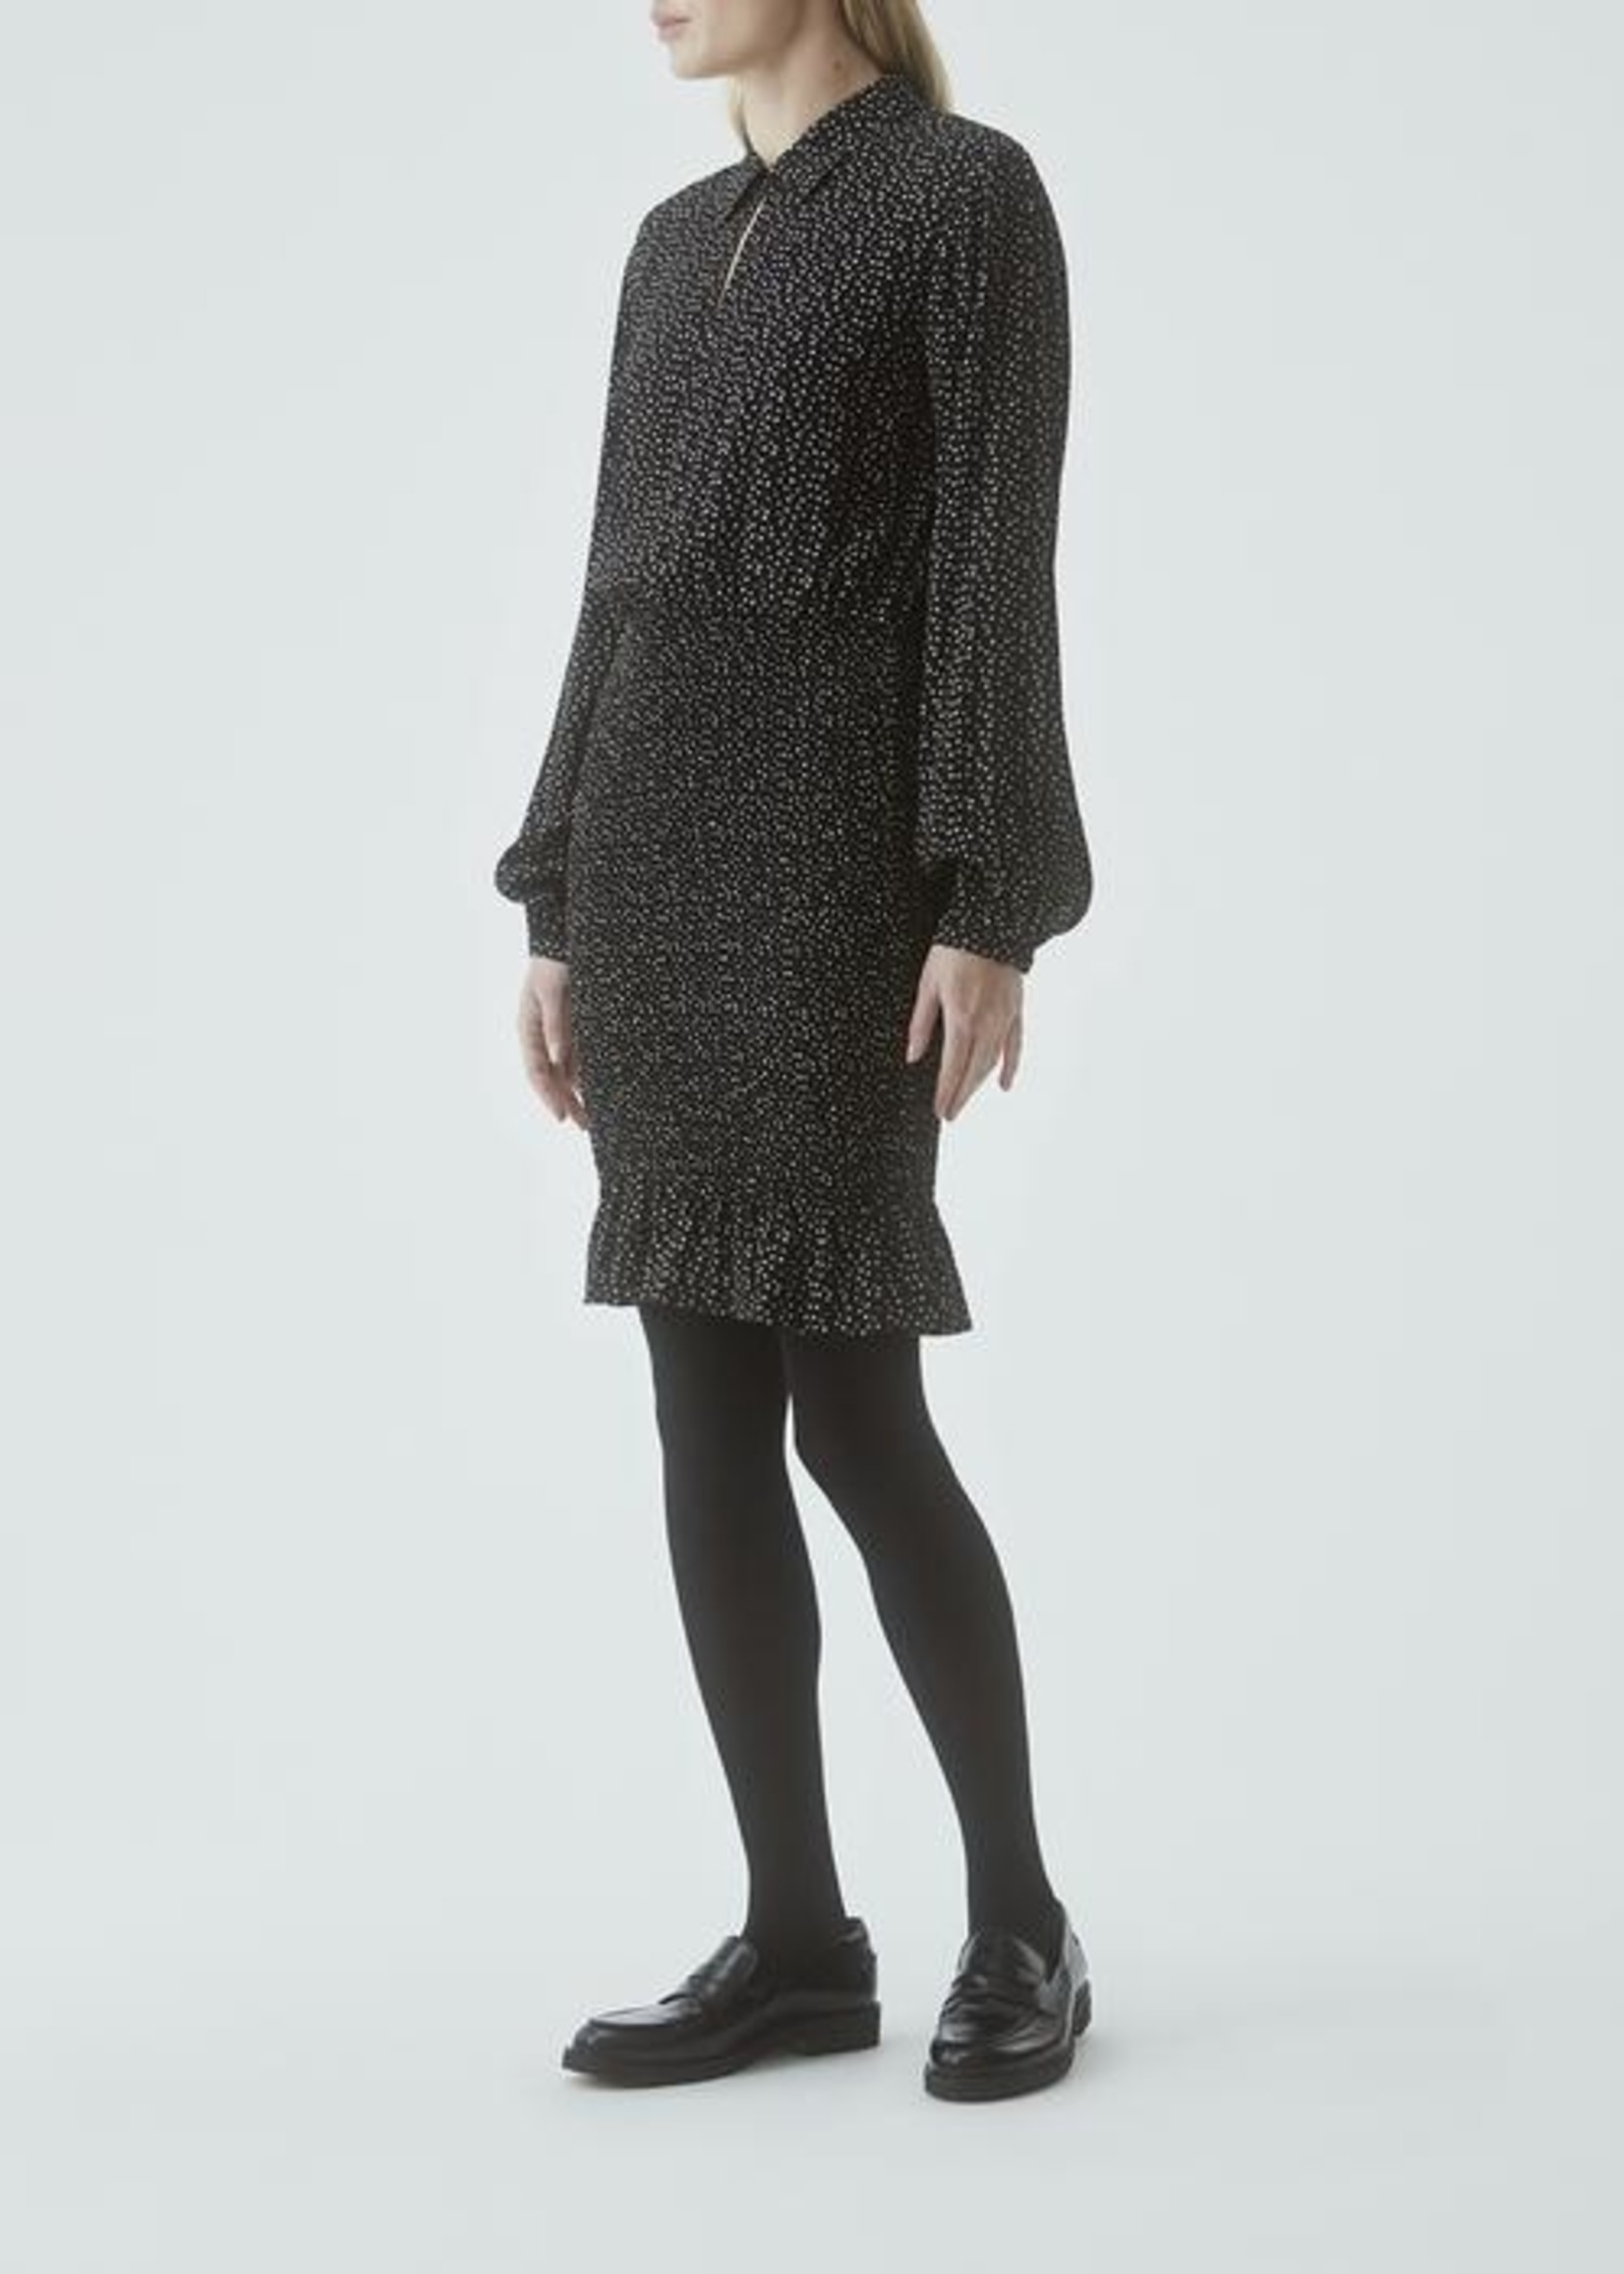 Modström Mia Print Dress